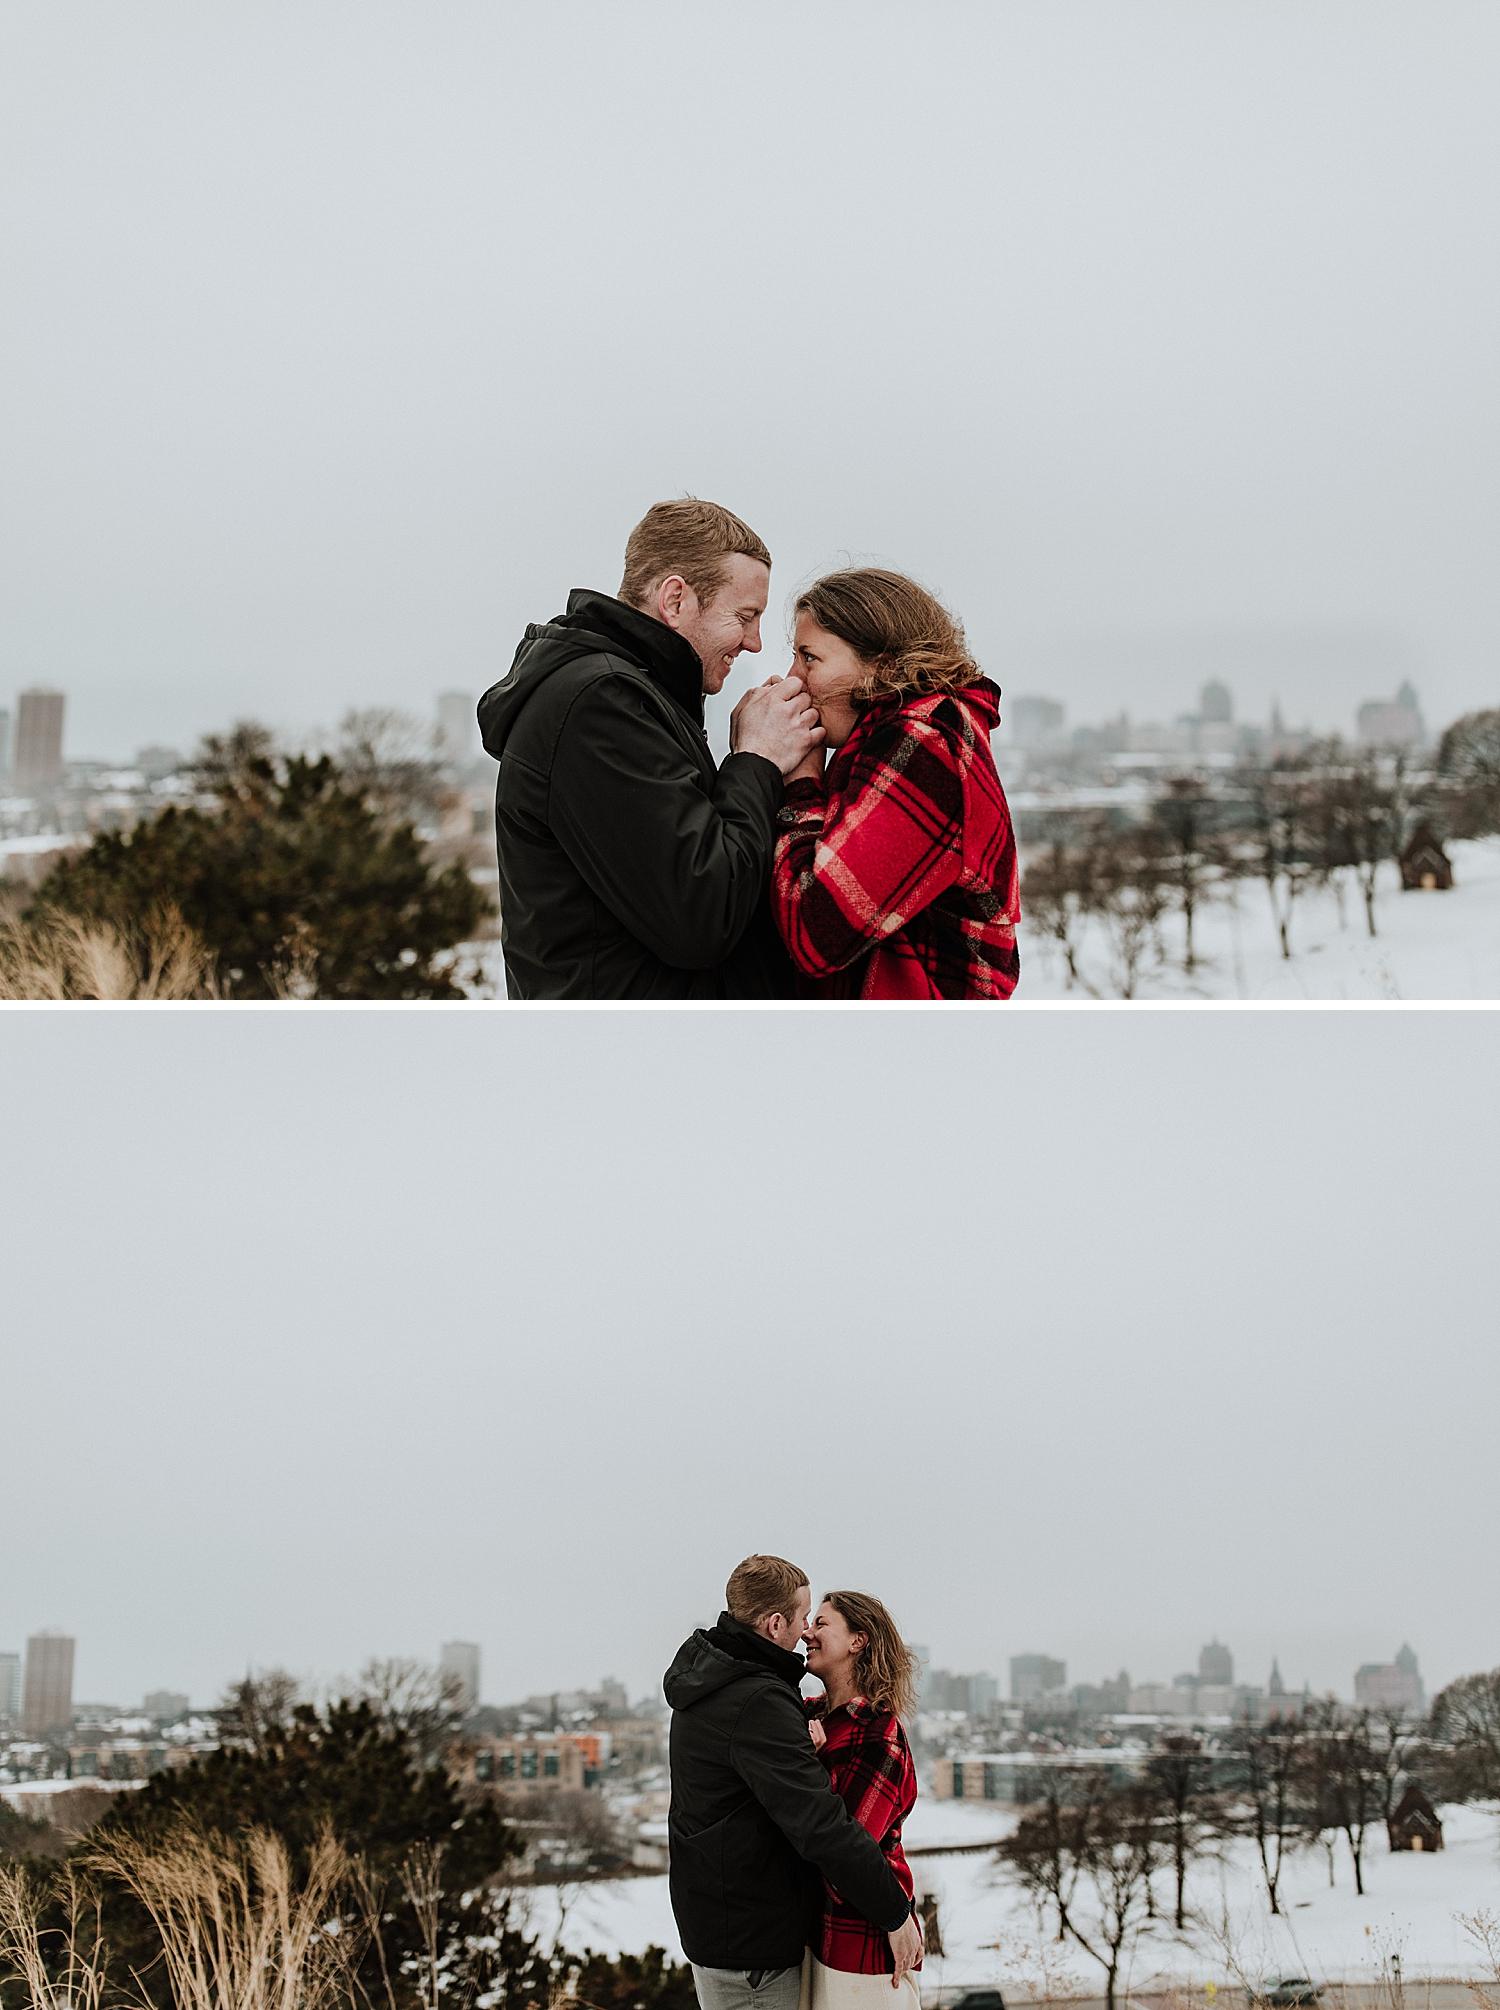 Winter-engagement-session_0015.jpg